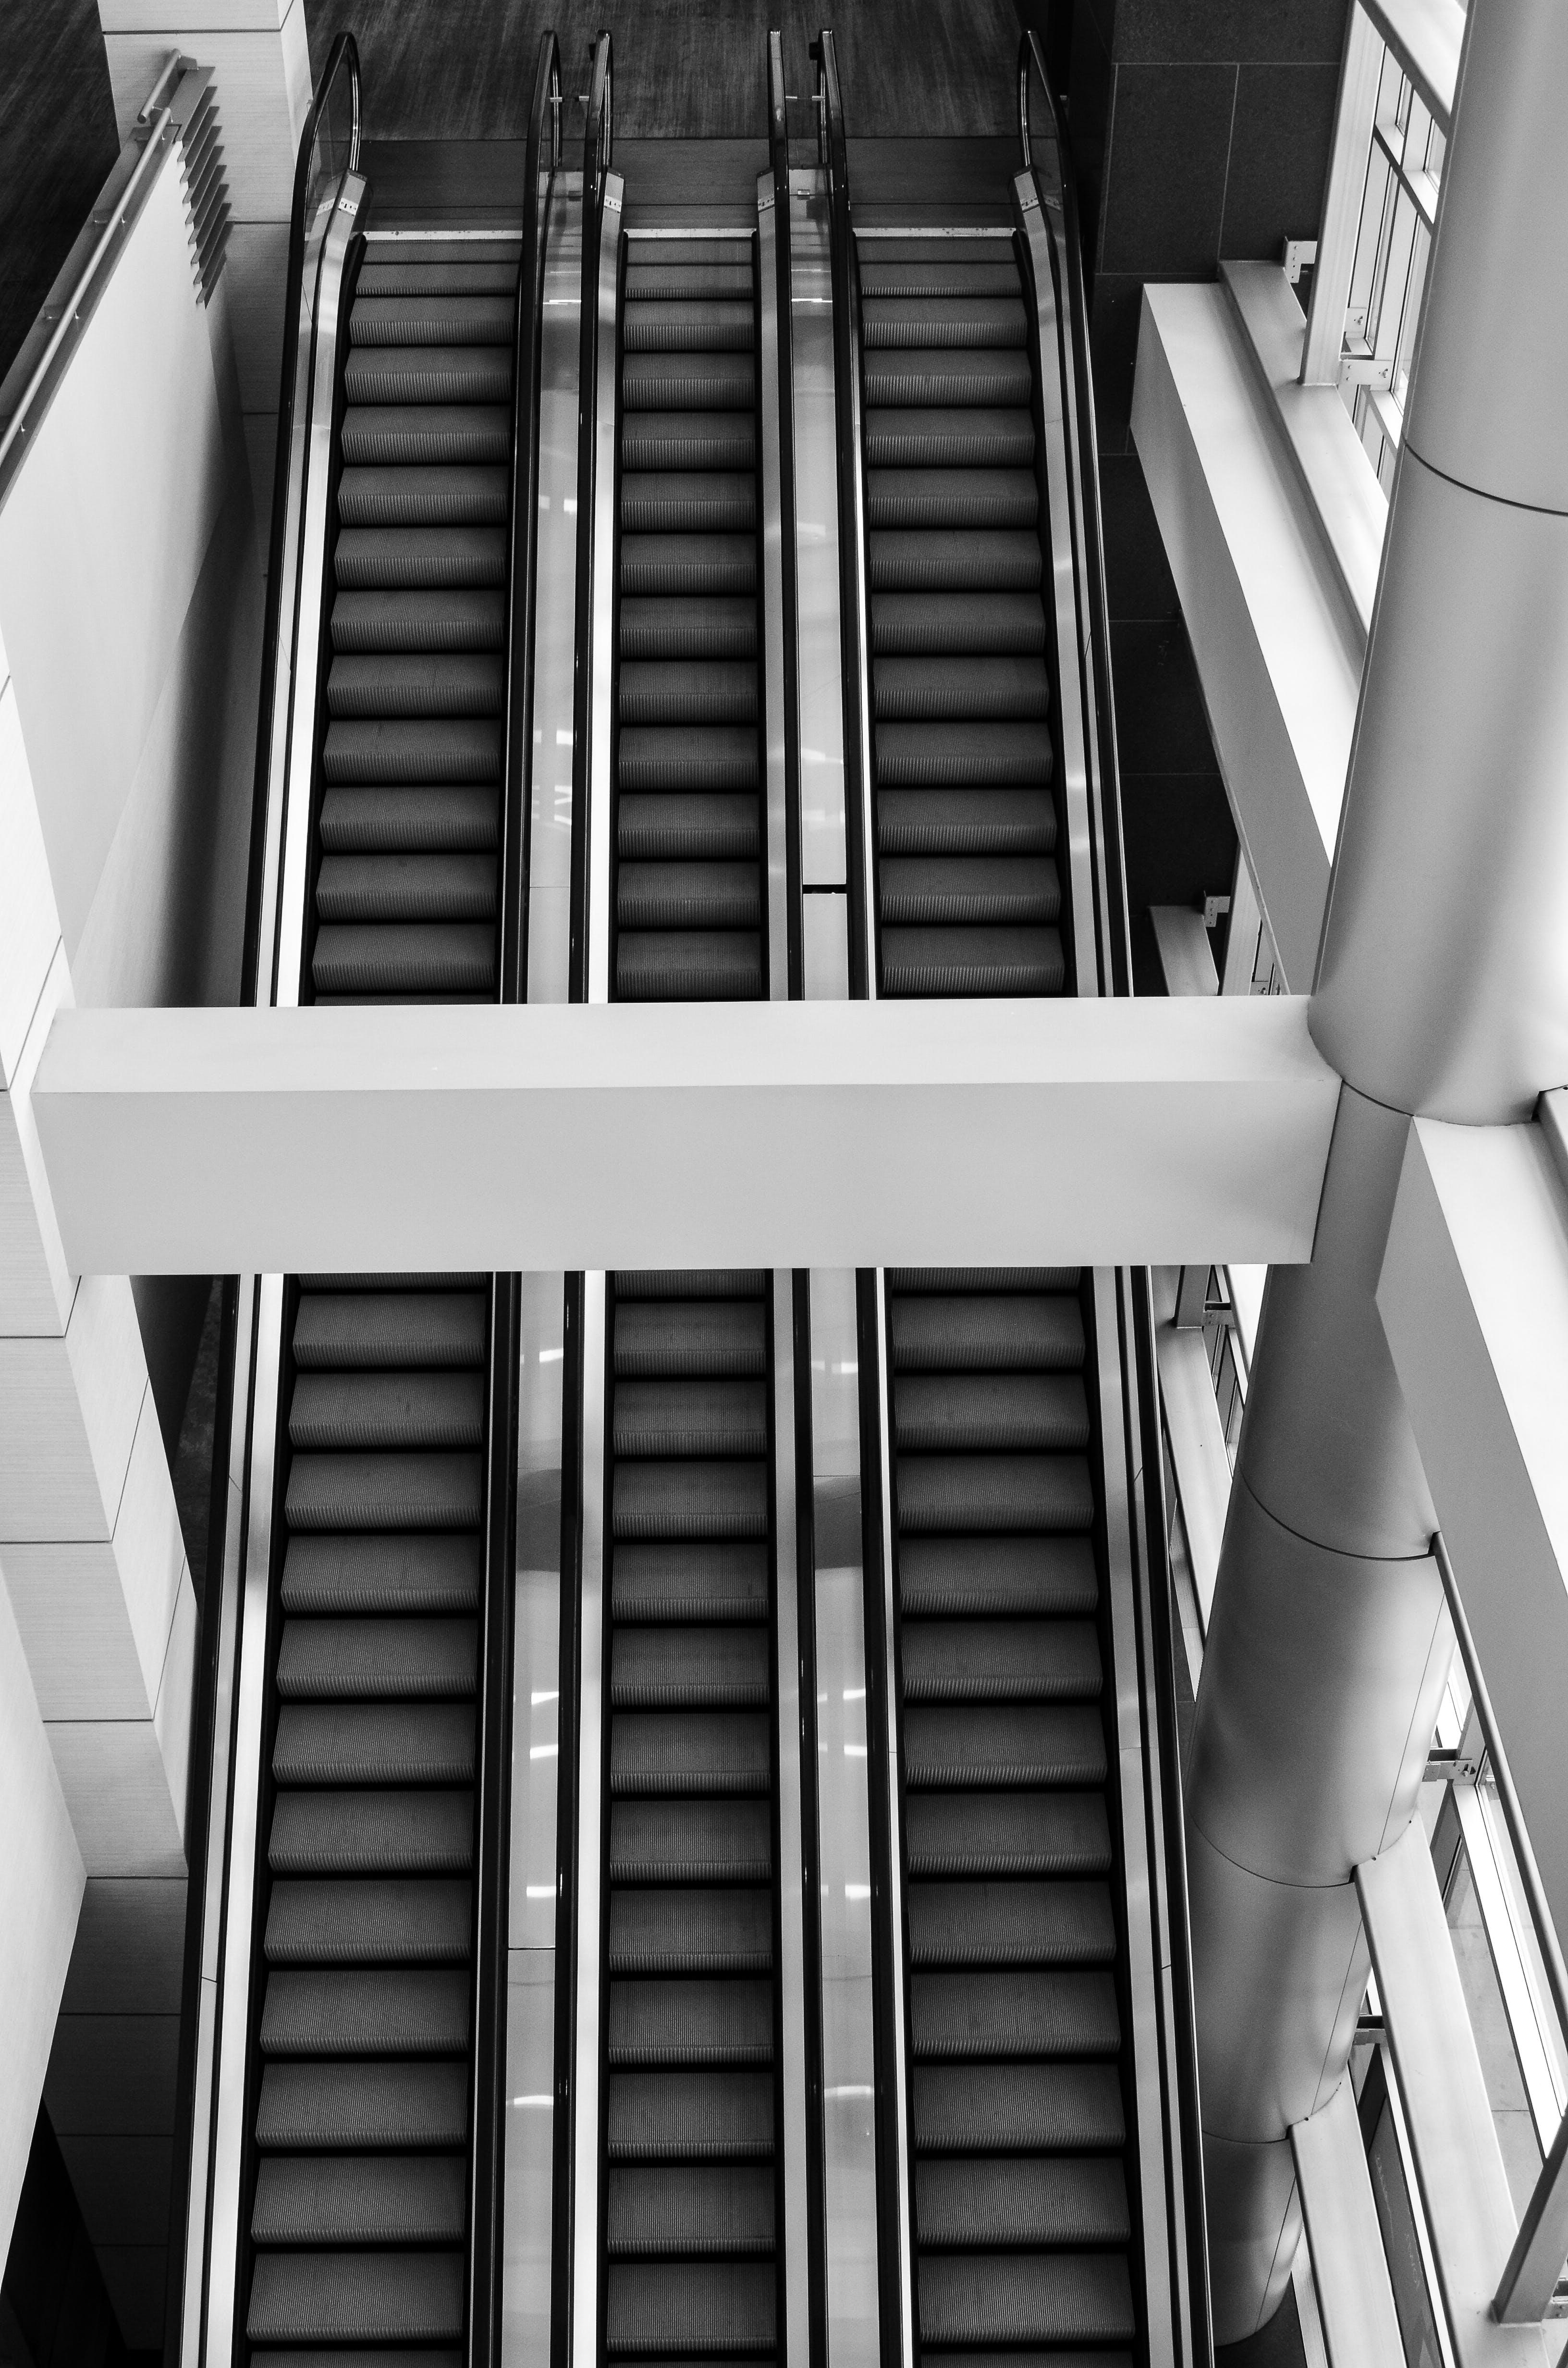 Grayscale Photo of Escalator